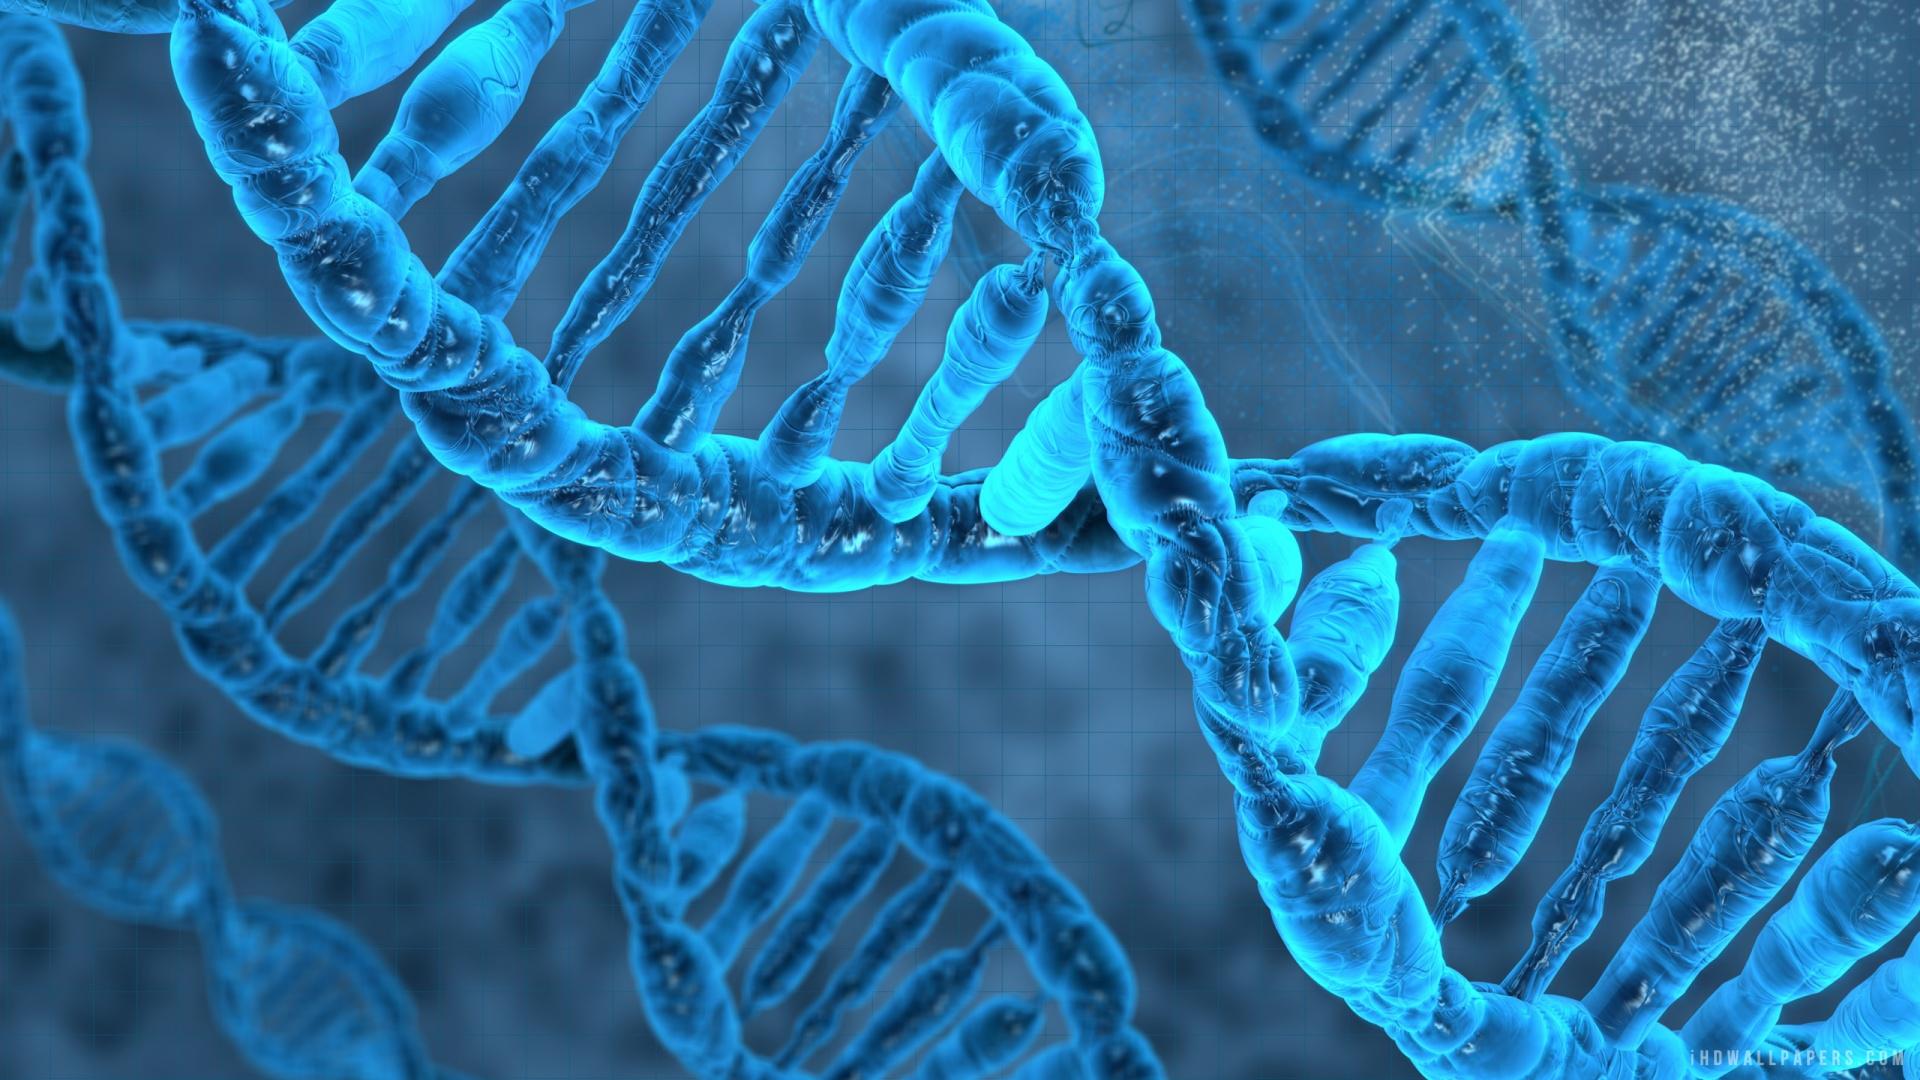 DNA Molecule HD Wallpaper   iHD Wallpapers 1920x1080